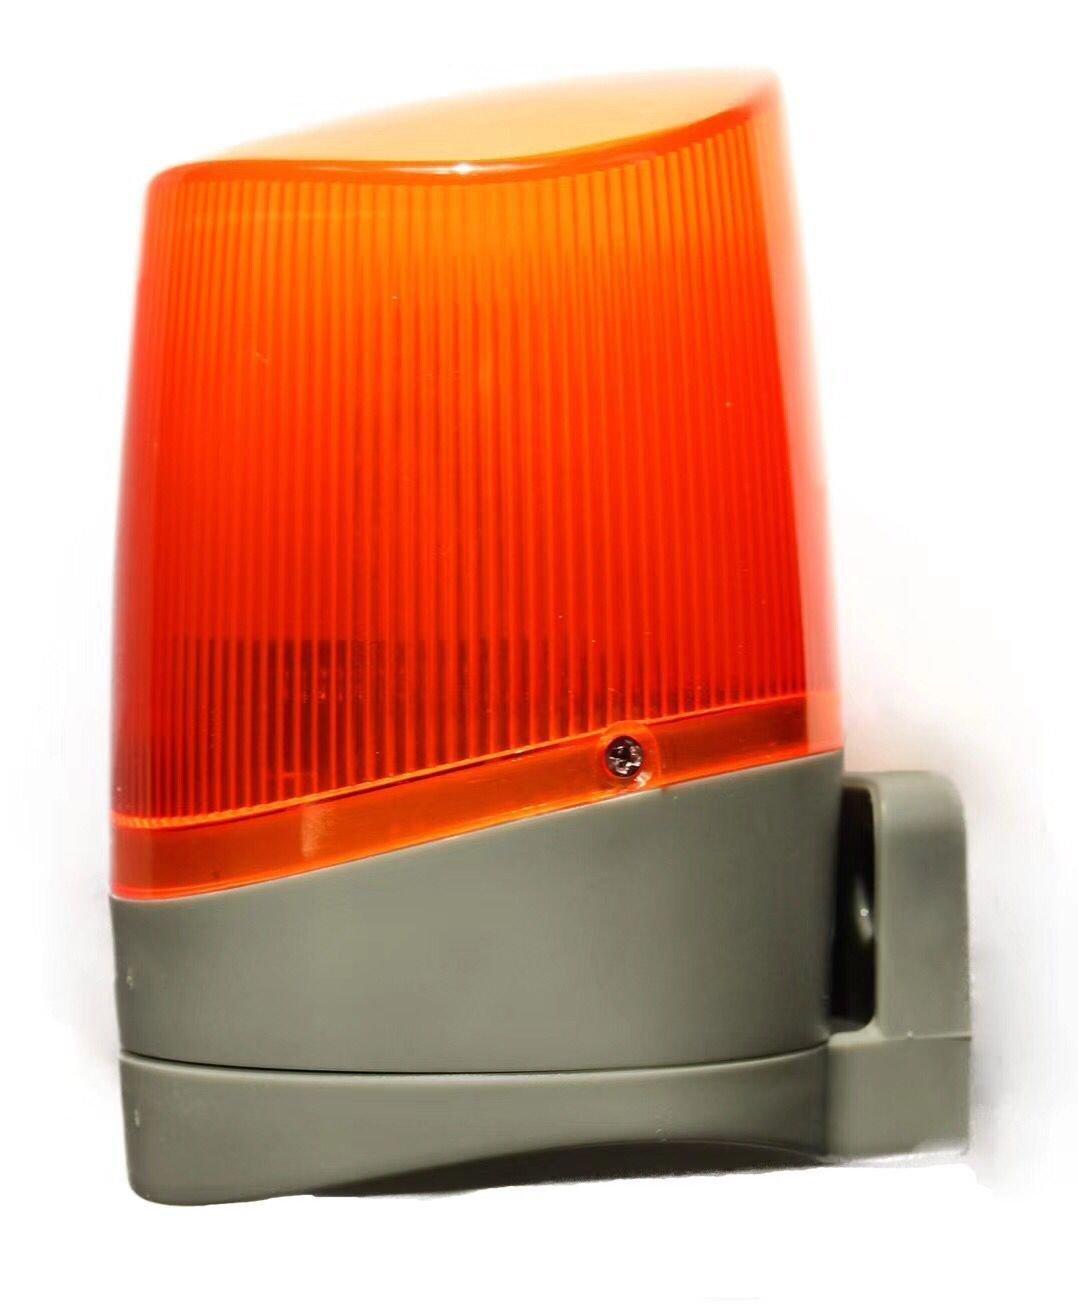 NSEE G5001R 110V AC LED Bulb Gate Opener Strobe Flash Lamp Light Wall Mounted